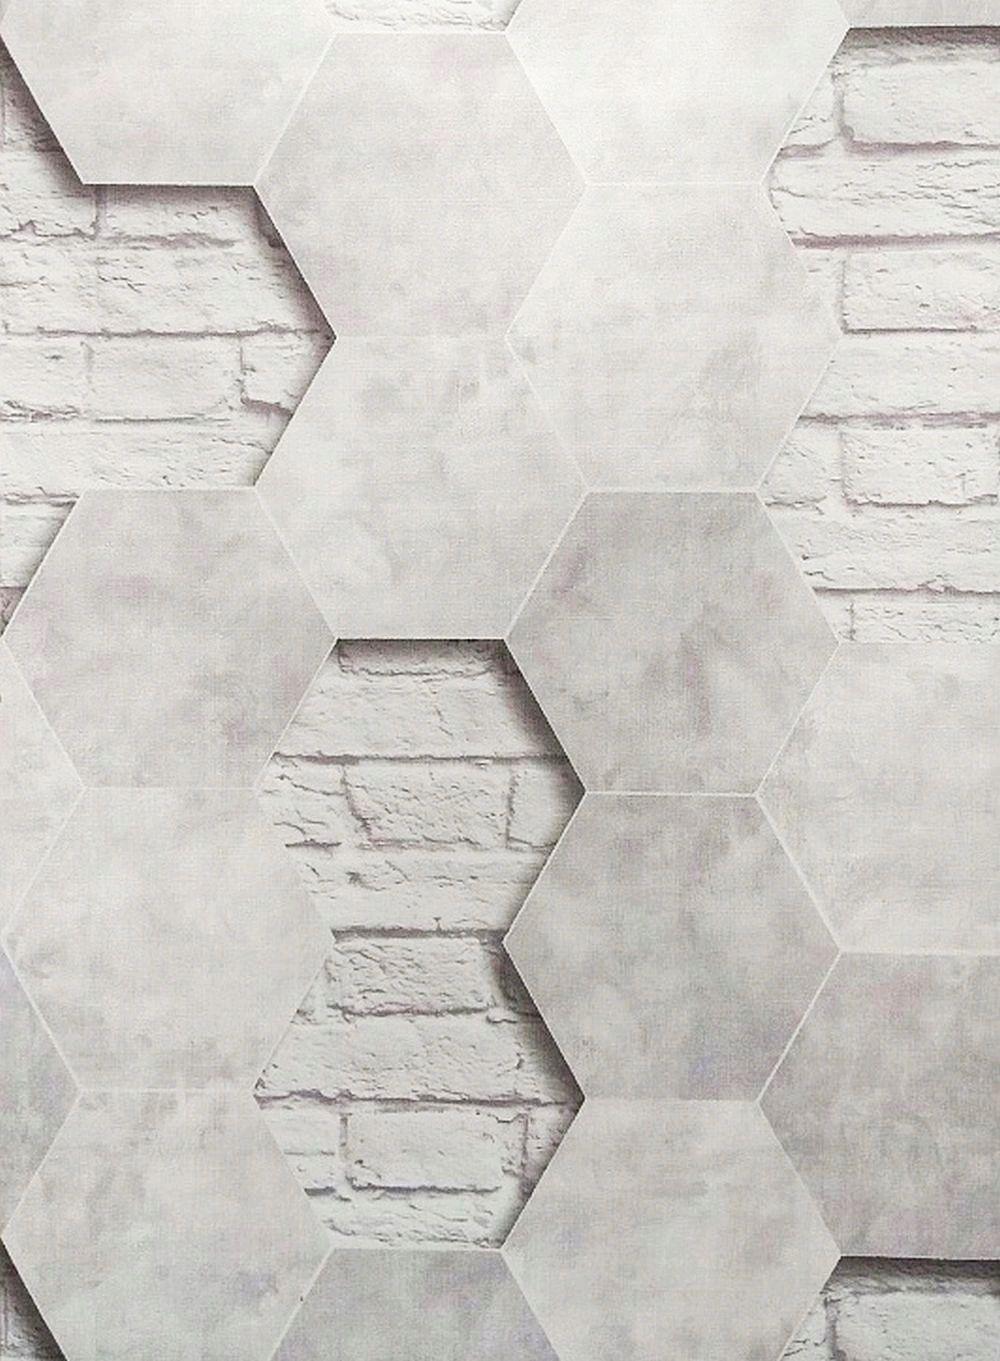 Wzory 3d Tapeta Na Flizelinie Heksagon I Mur 8414211942 Allegro Pl Restaurant Interior Flooring Interior